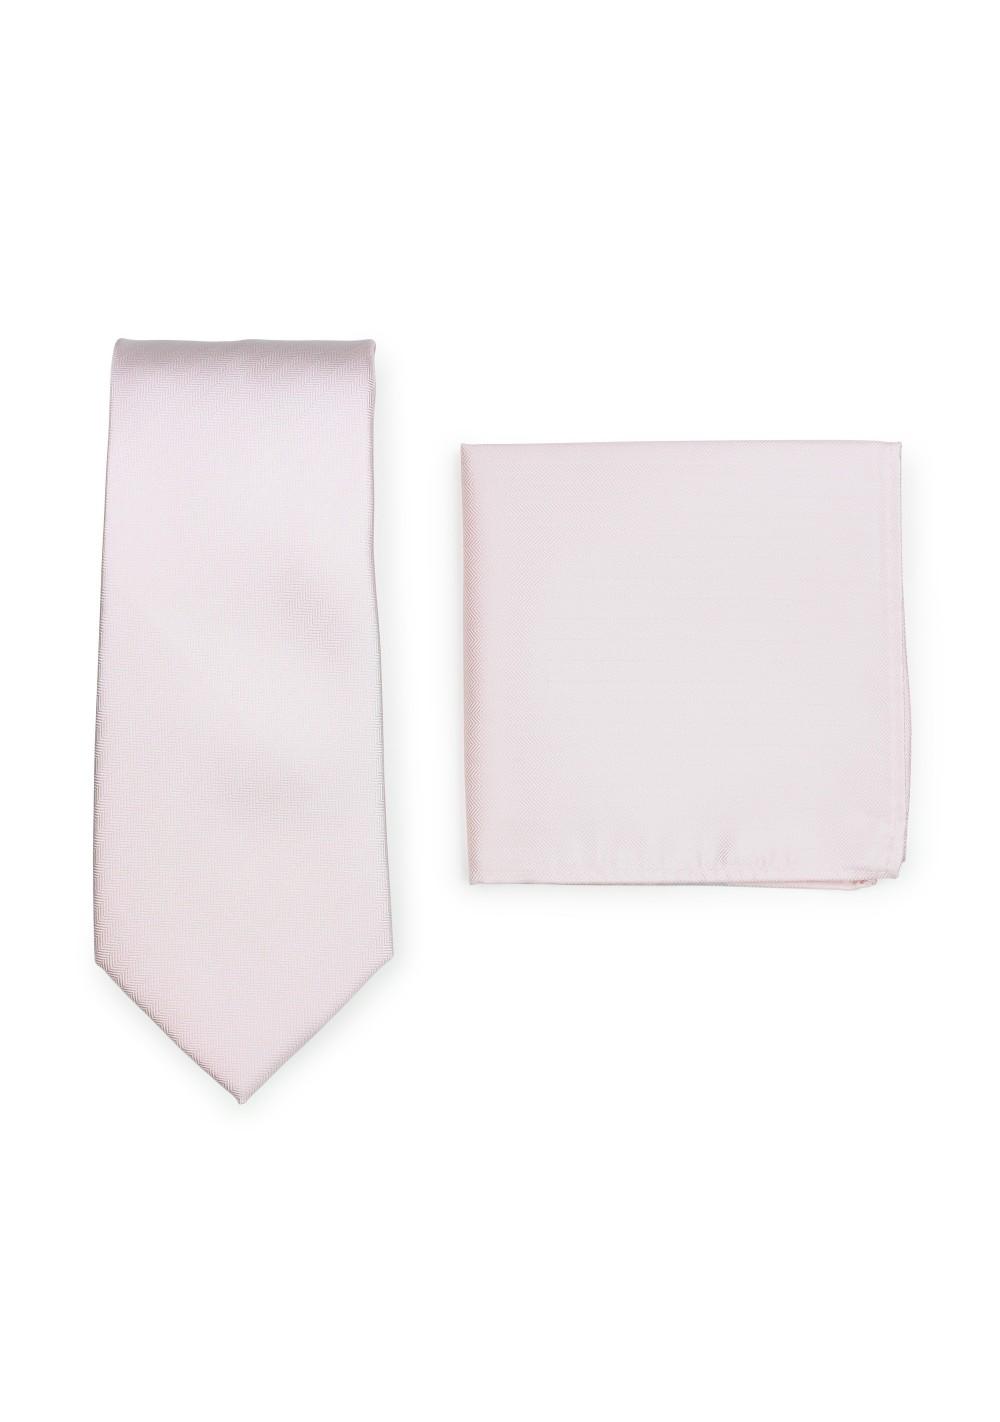 Herringbone Weave Necktie Set in Blush